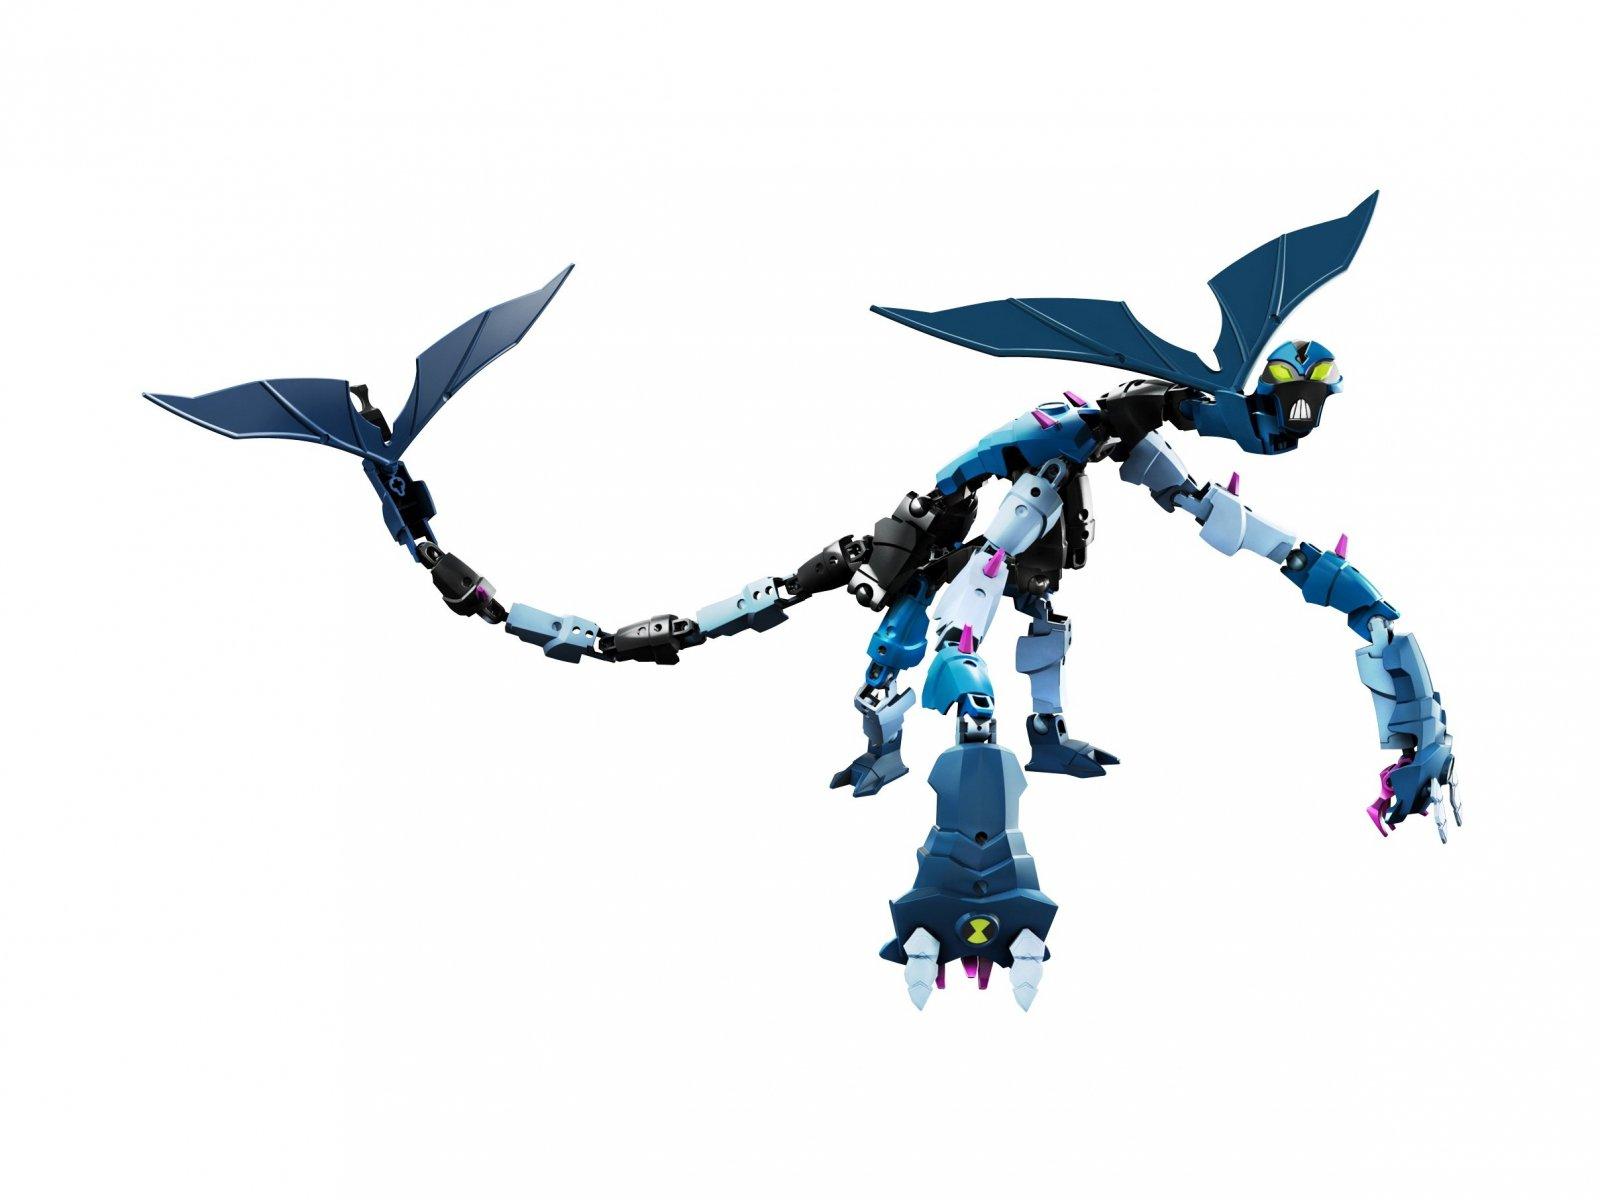 LEGO Ben 10 Alien Force™ 8409 Pajęczarz